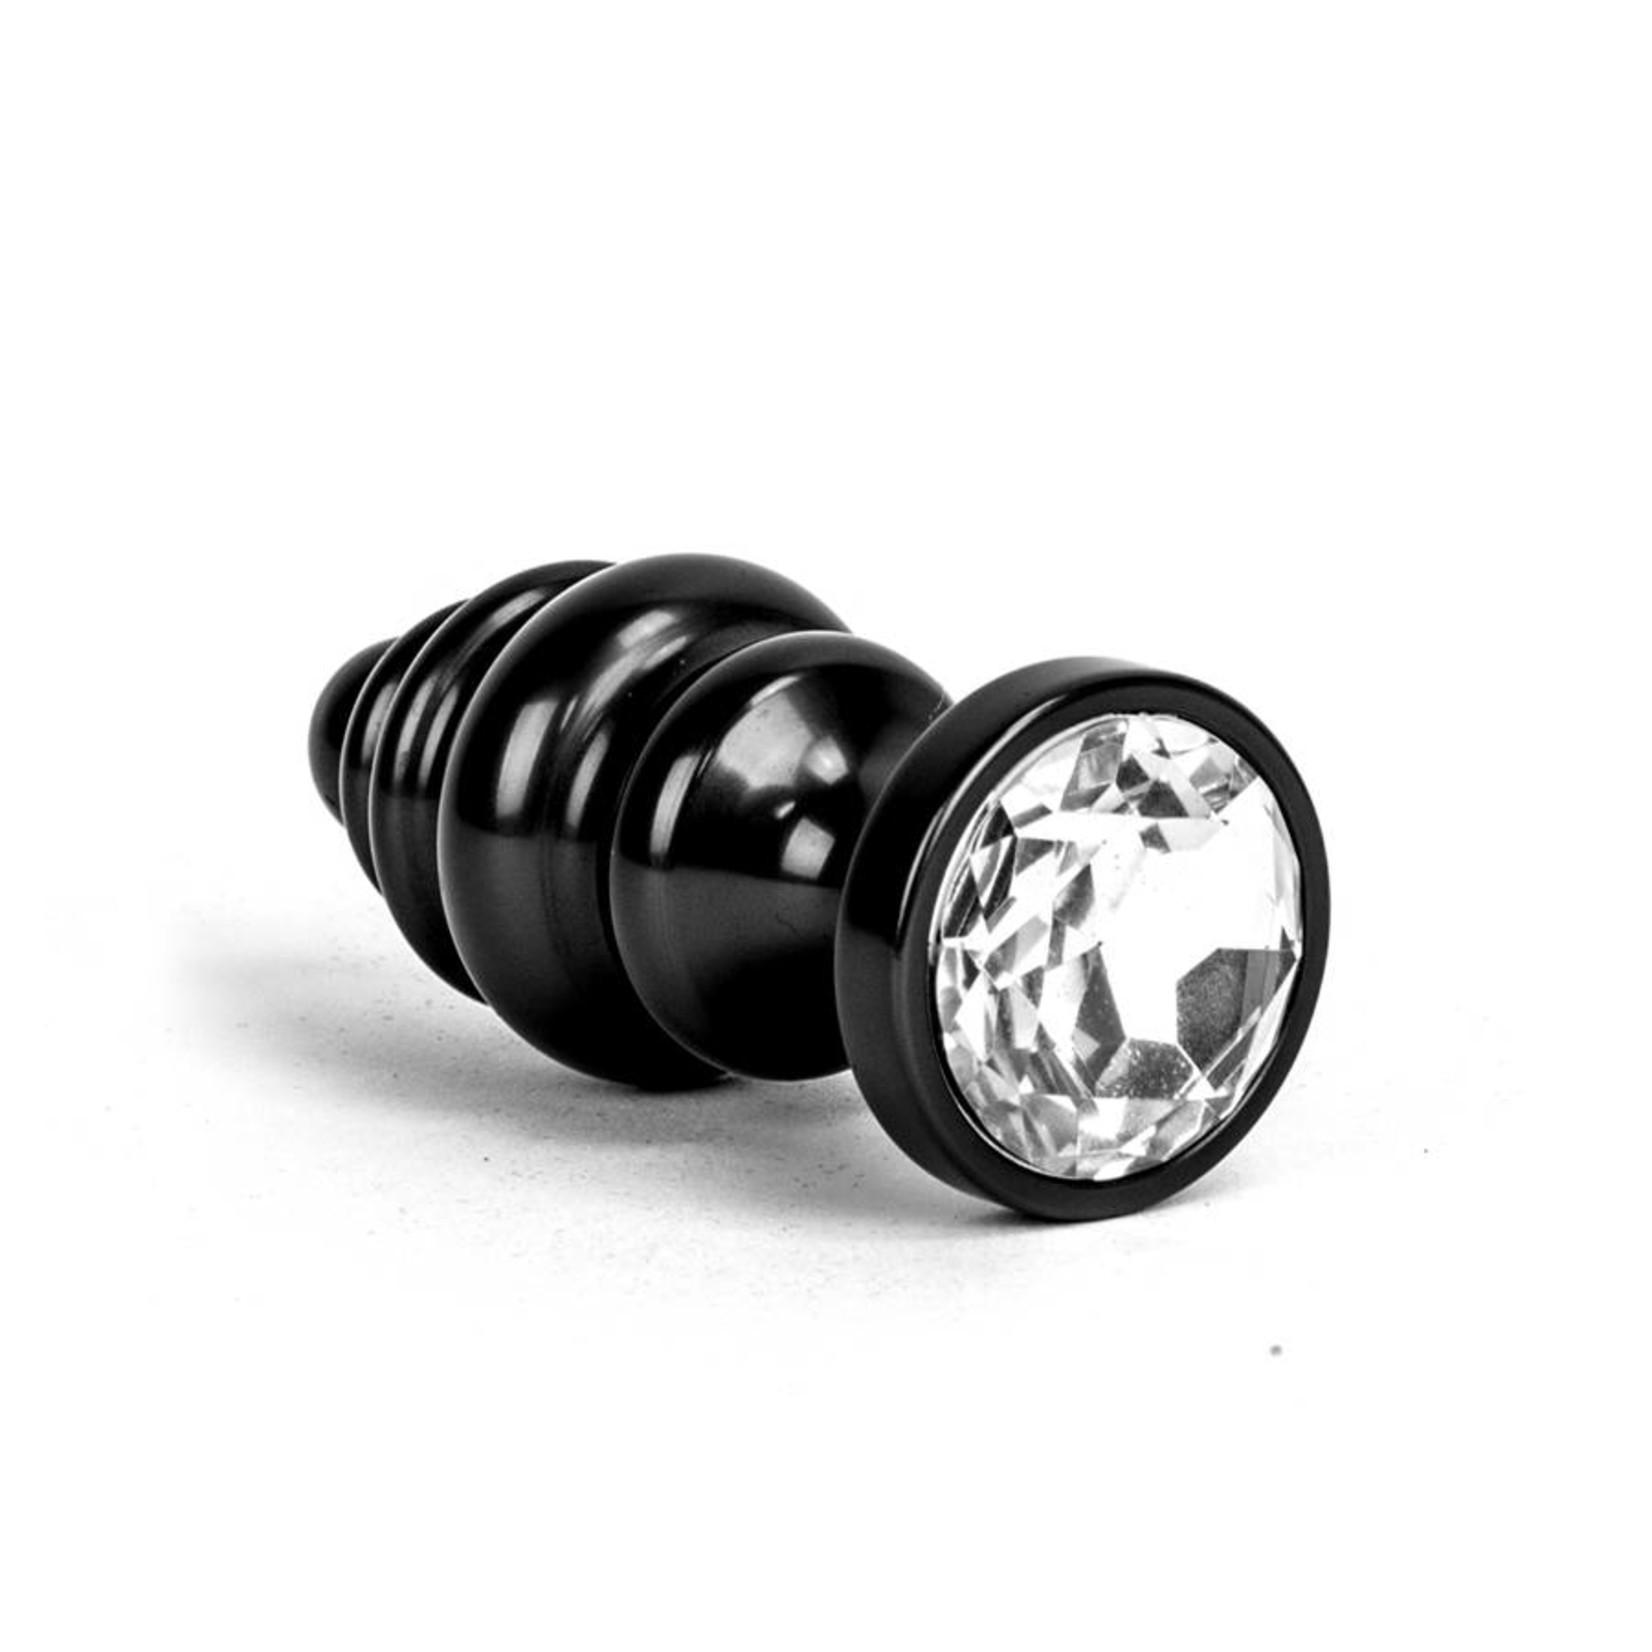 KIOTOS Aluminum Alloy Anal Plug 1 - Black